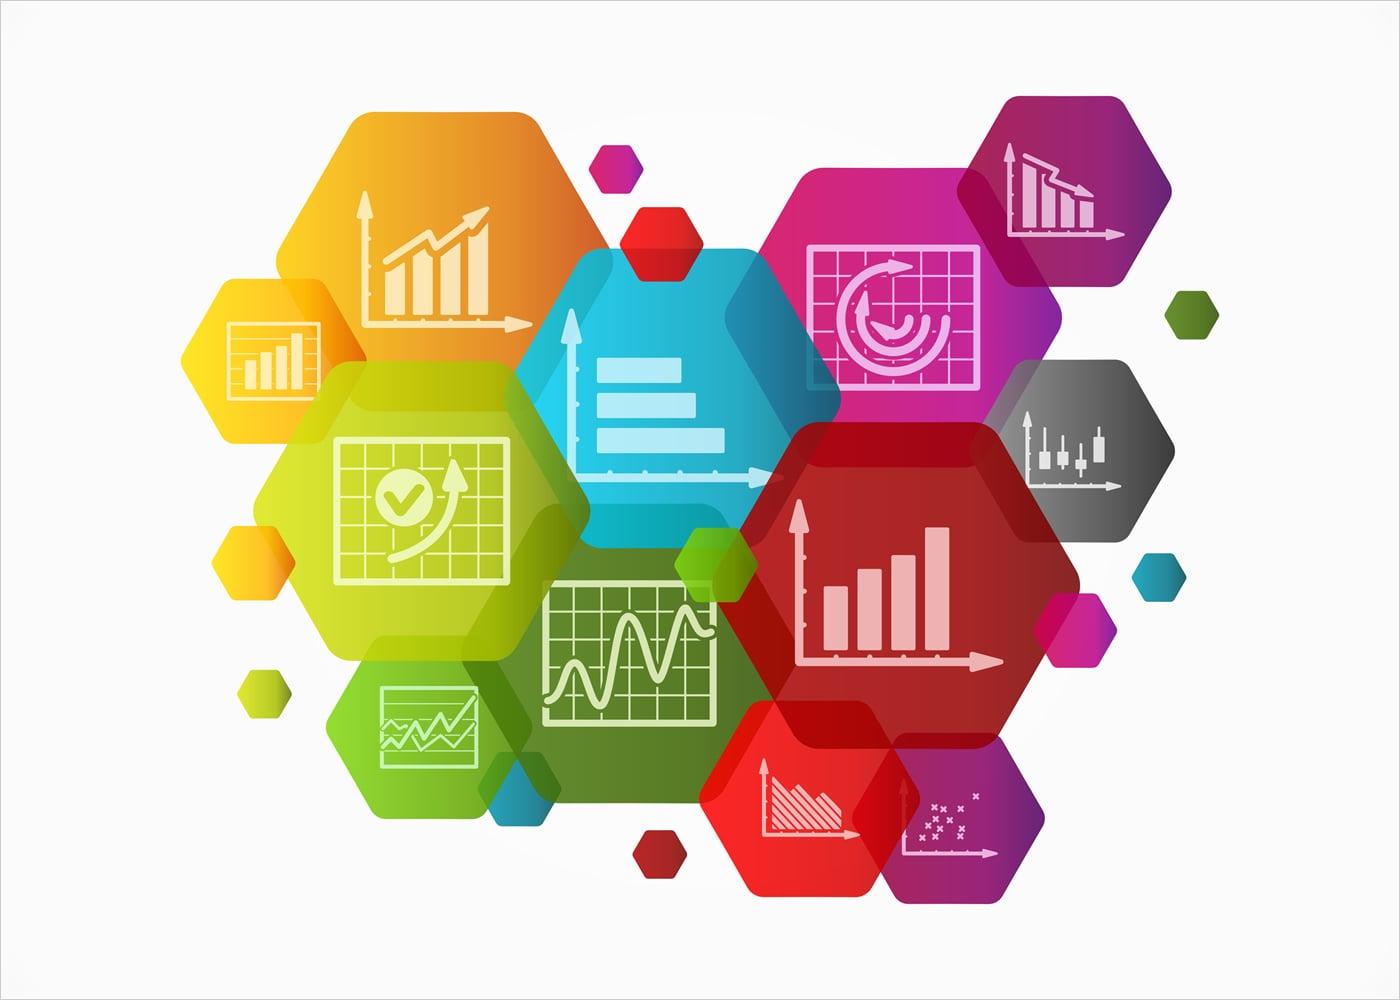 naem-webinar-2015-transforming-ehs-information-management-700x500